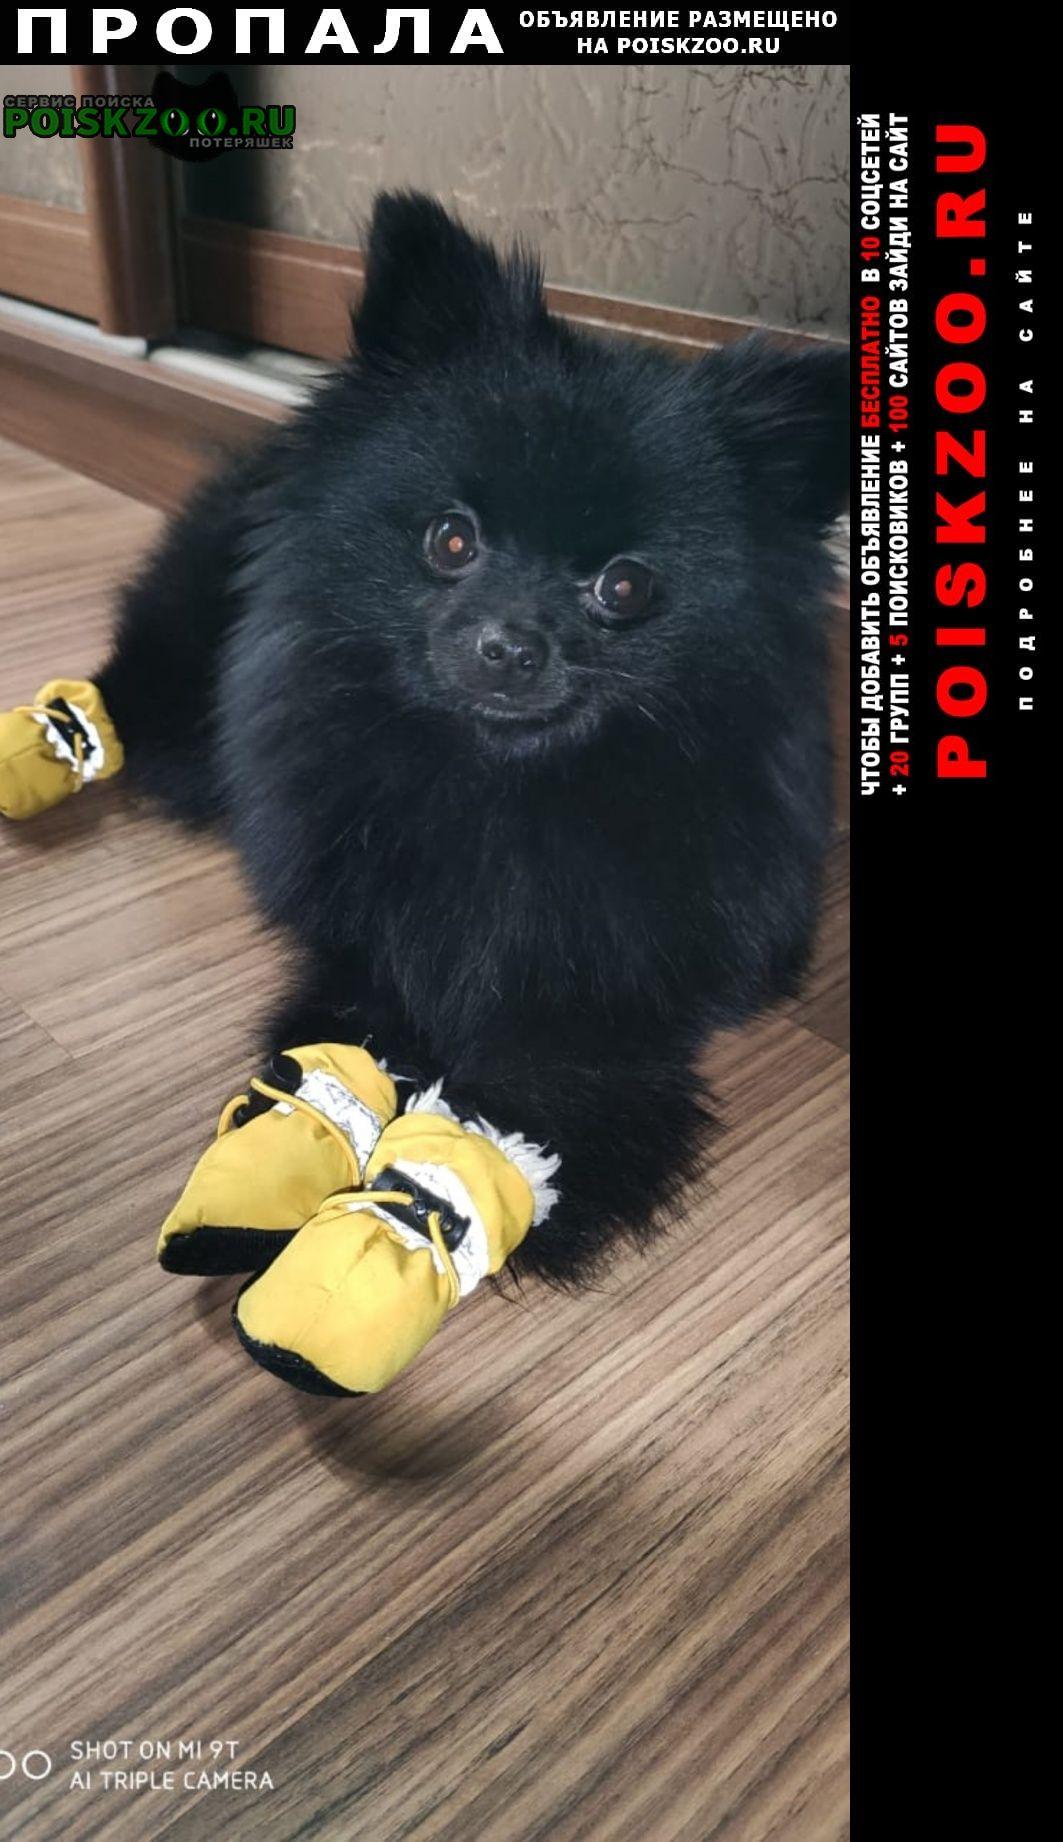 Пропала собака 9 месяцев Москва